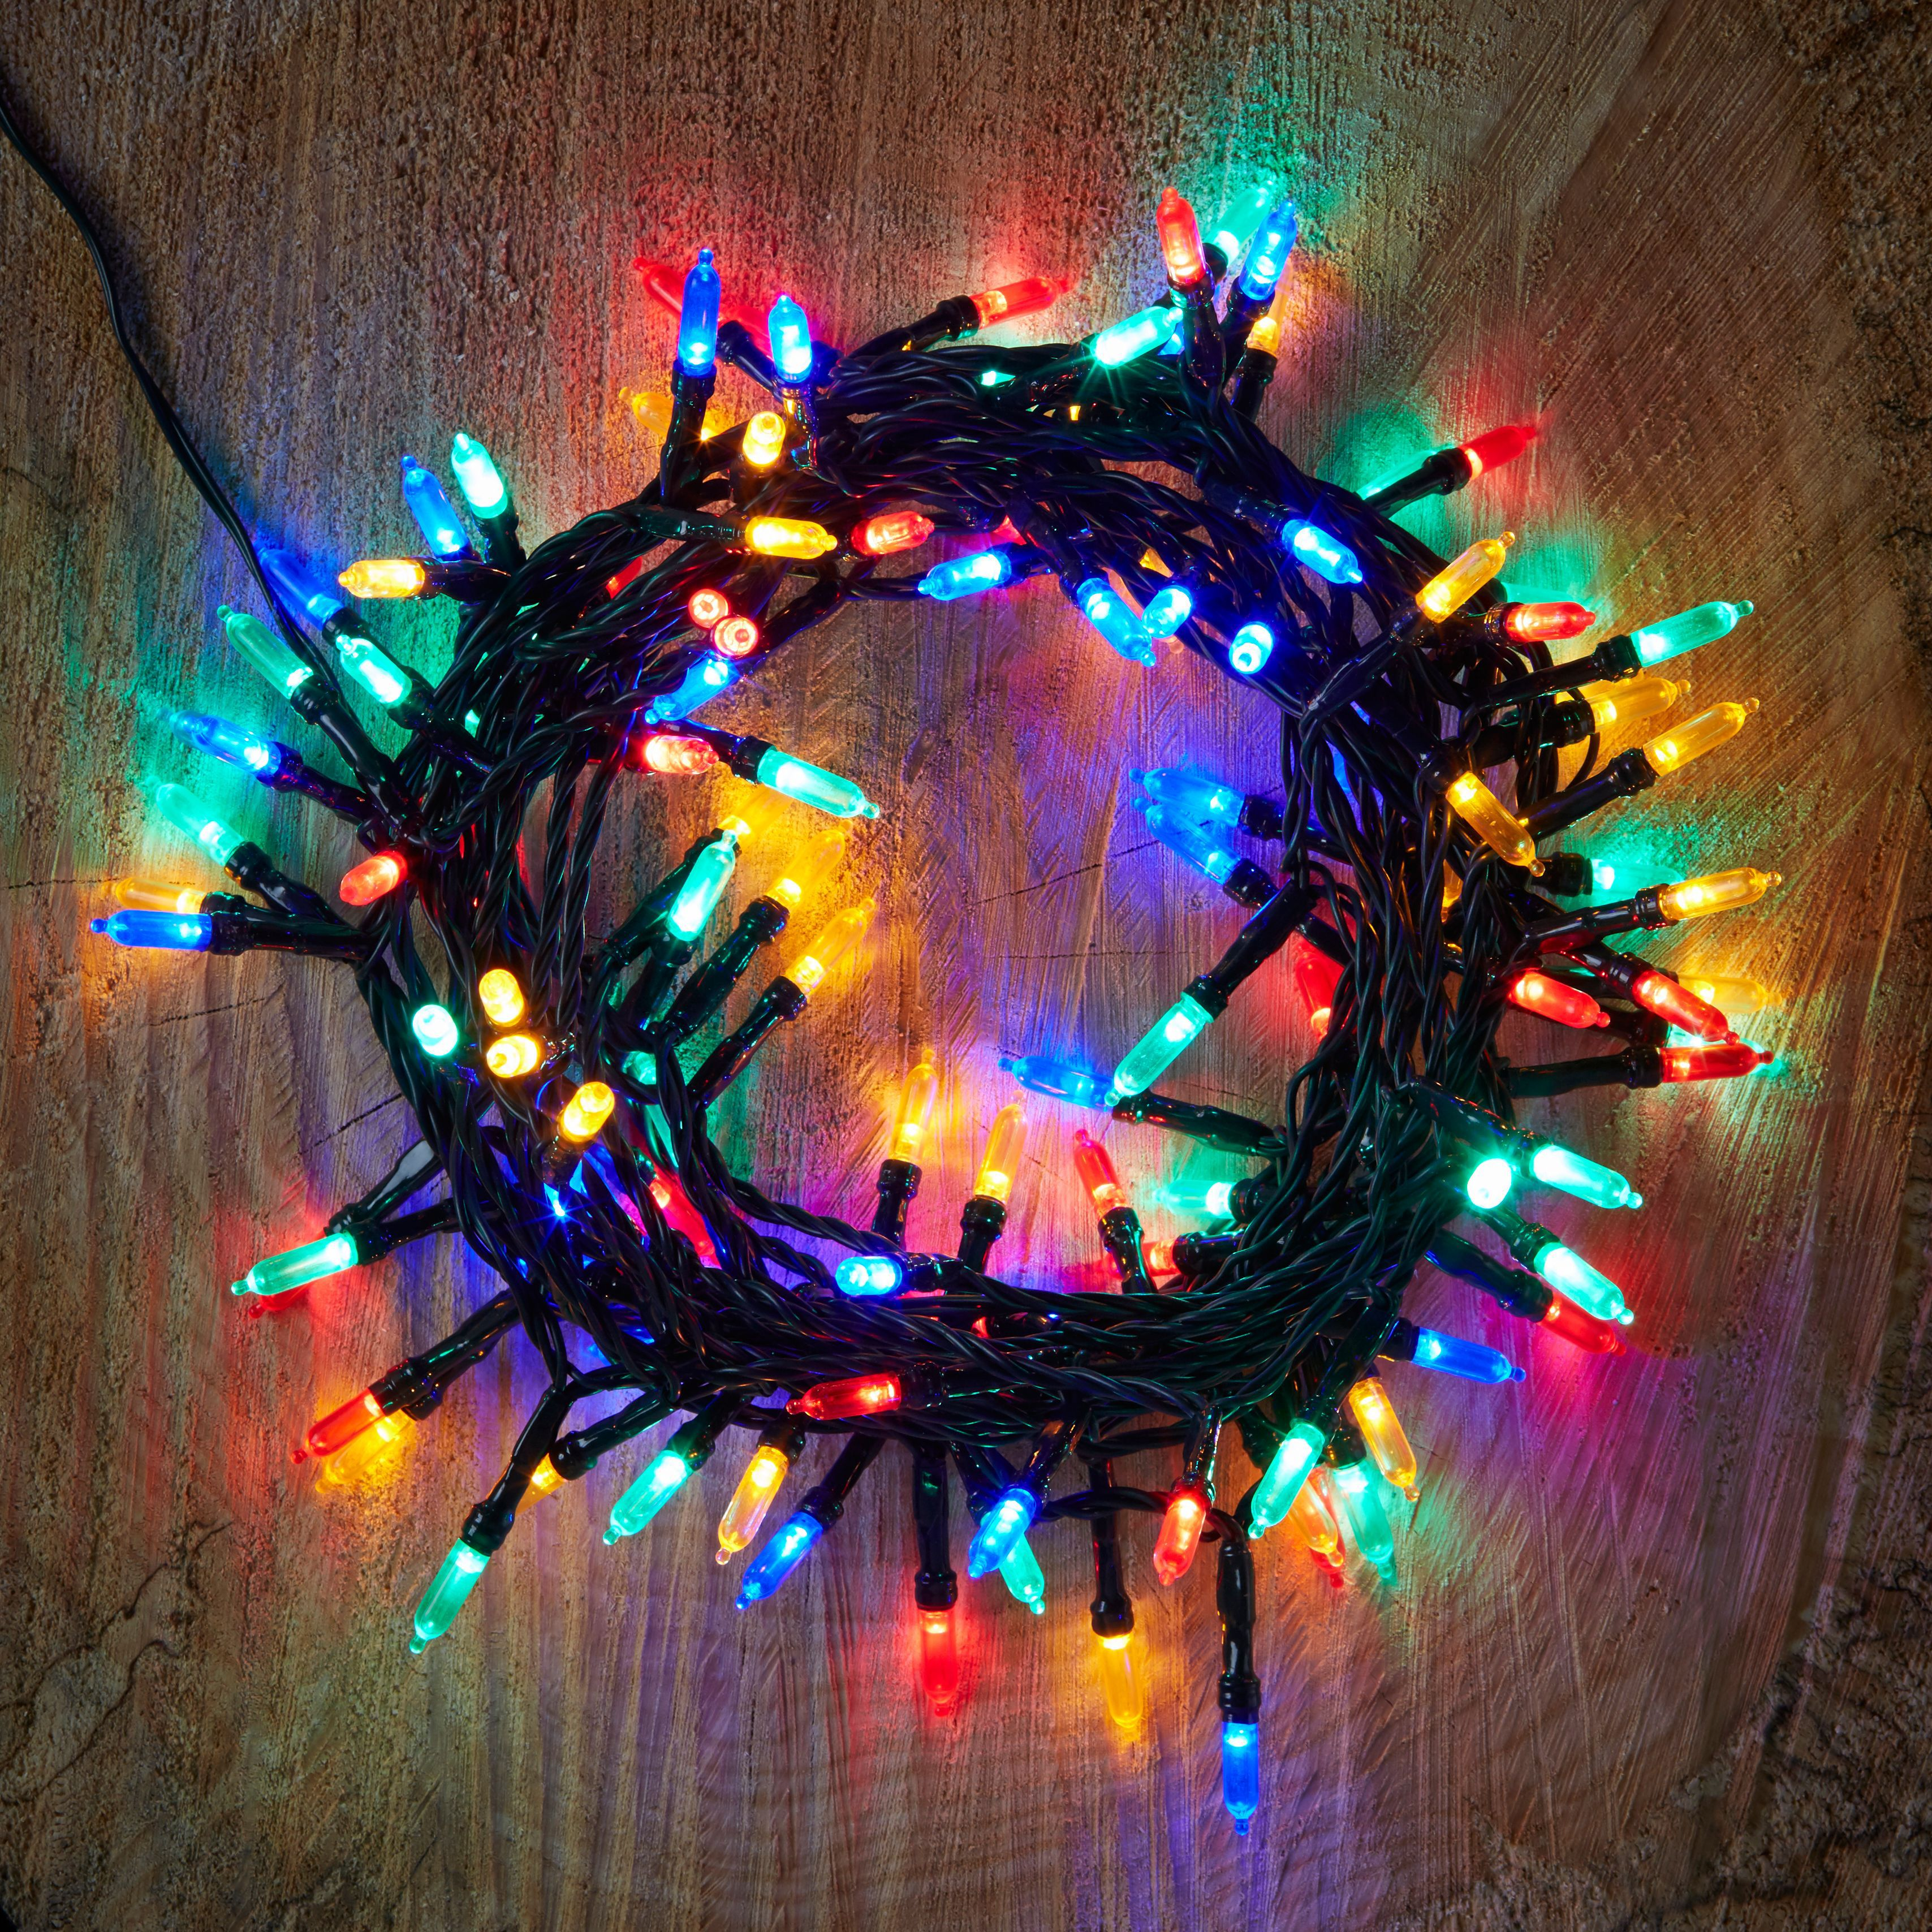 Outdoor string lights diy for Diy outdoor string lights